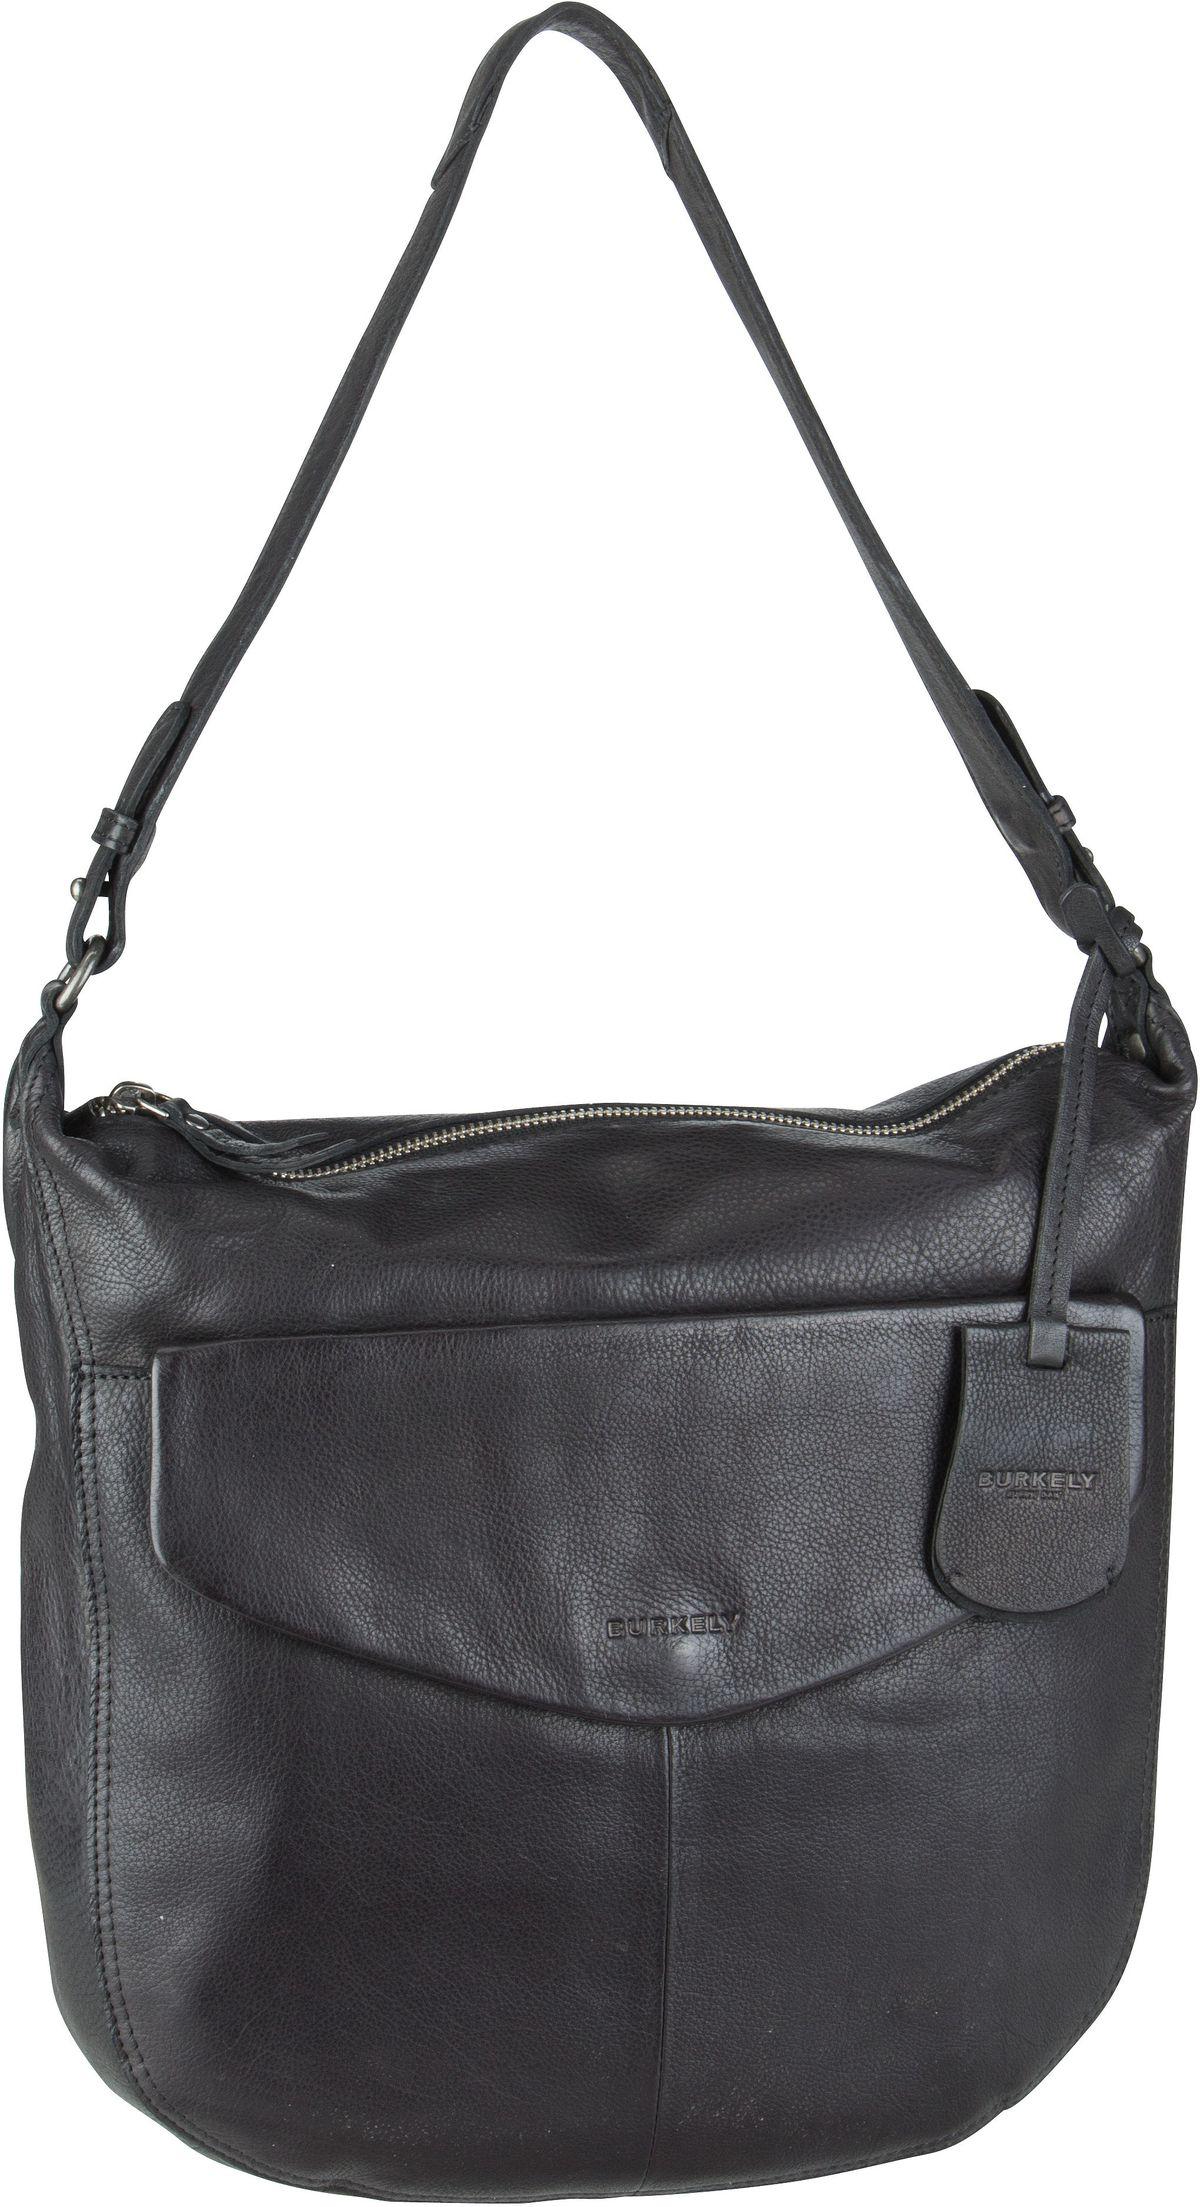 Burkely Handtasche Just Jackie Hobo 2484 Black